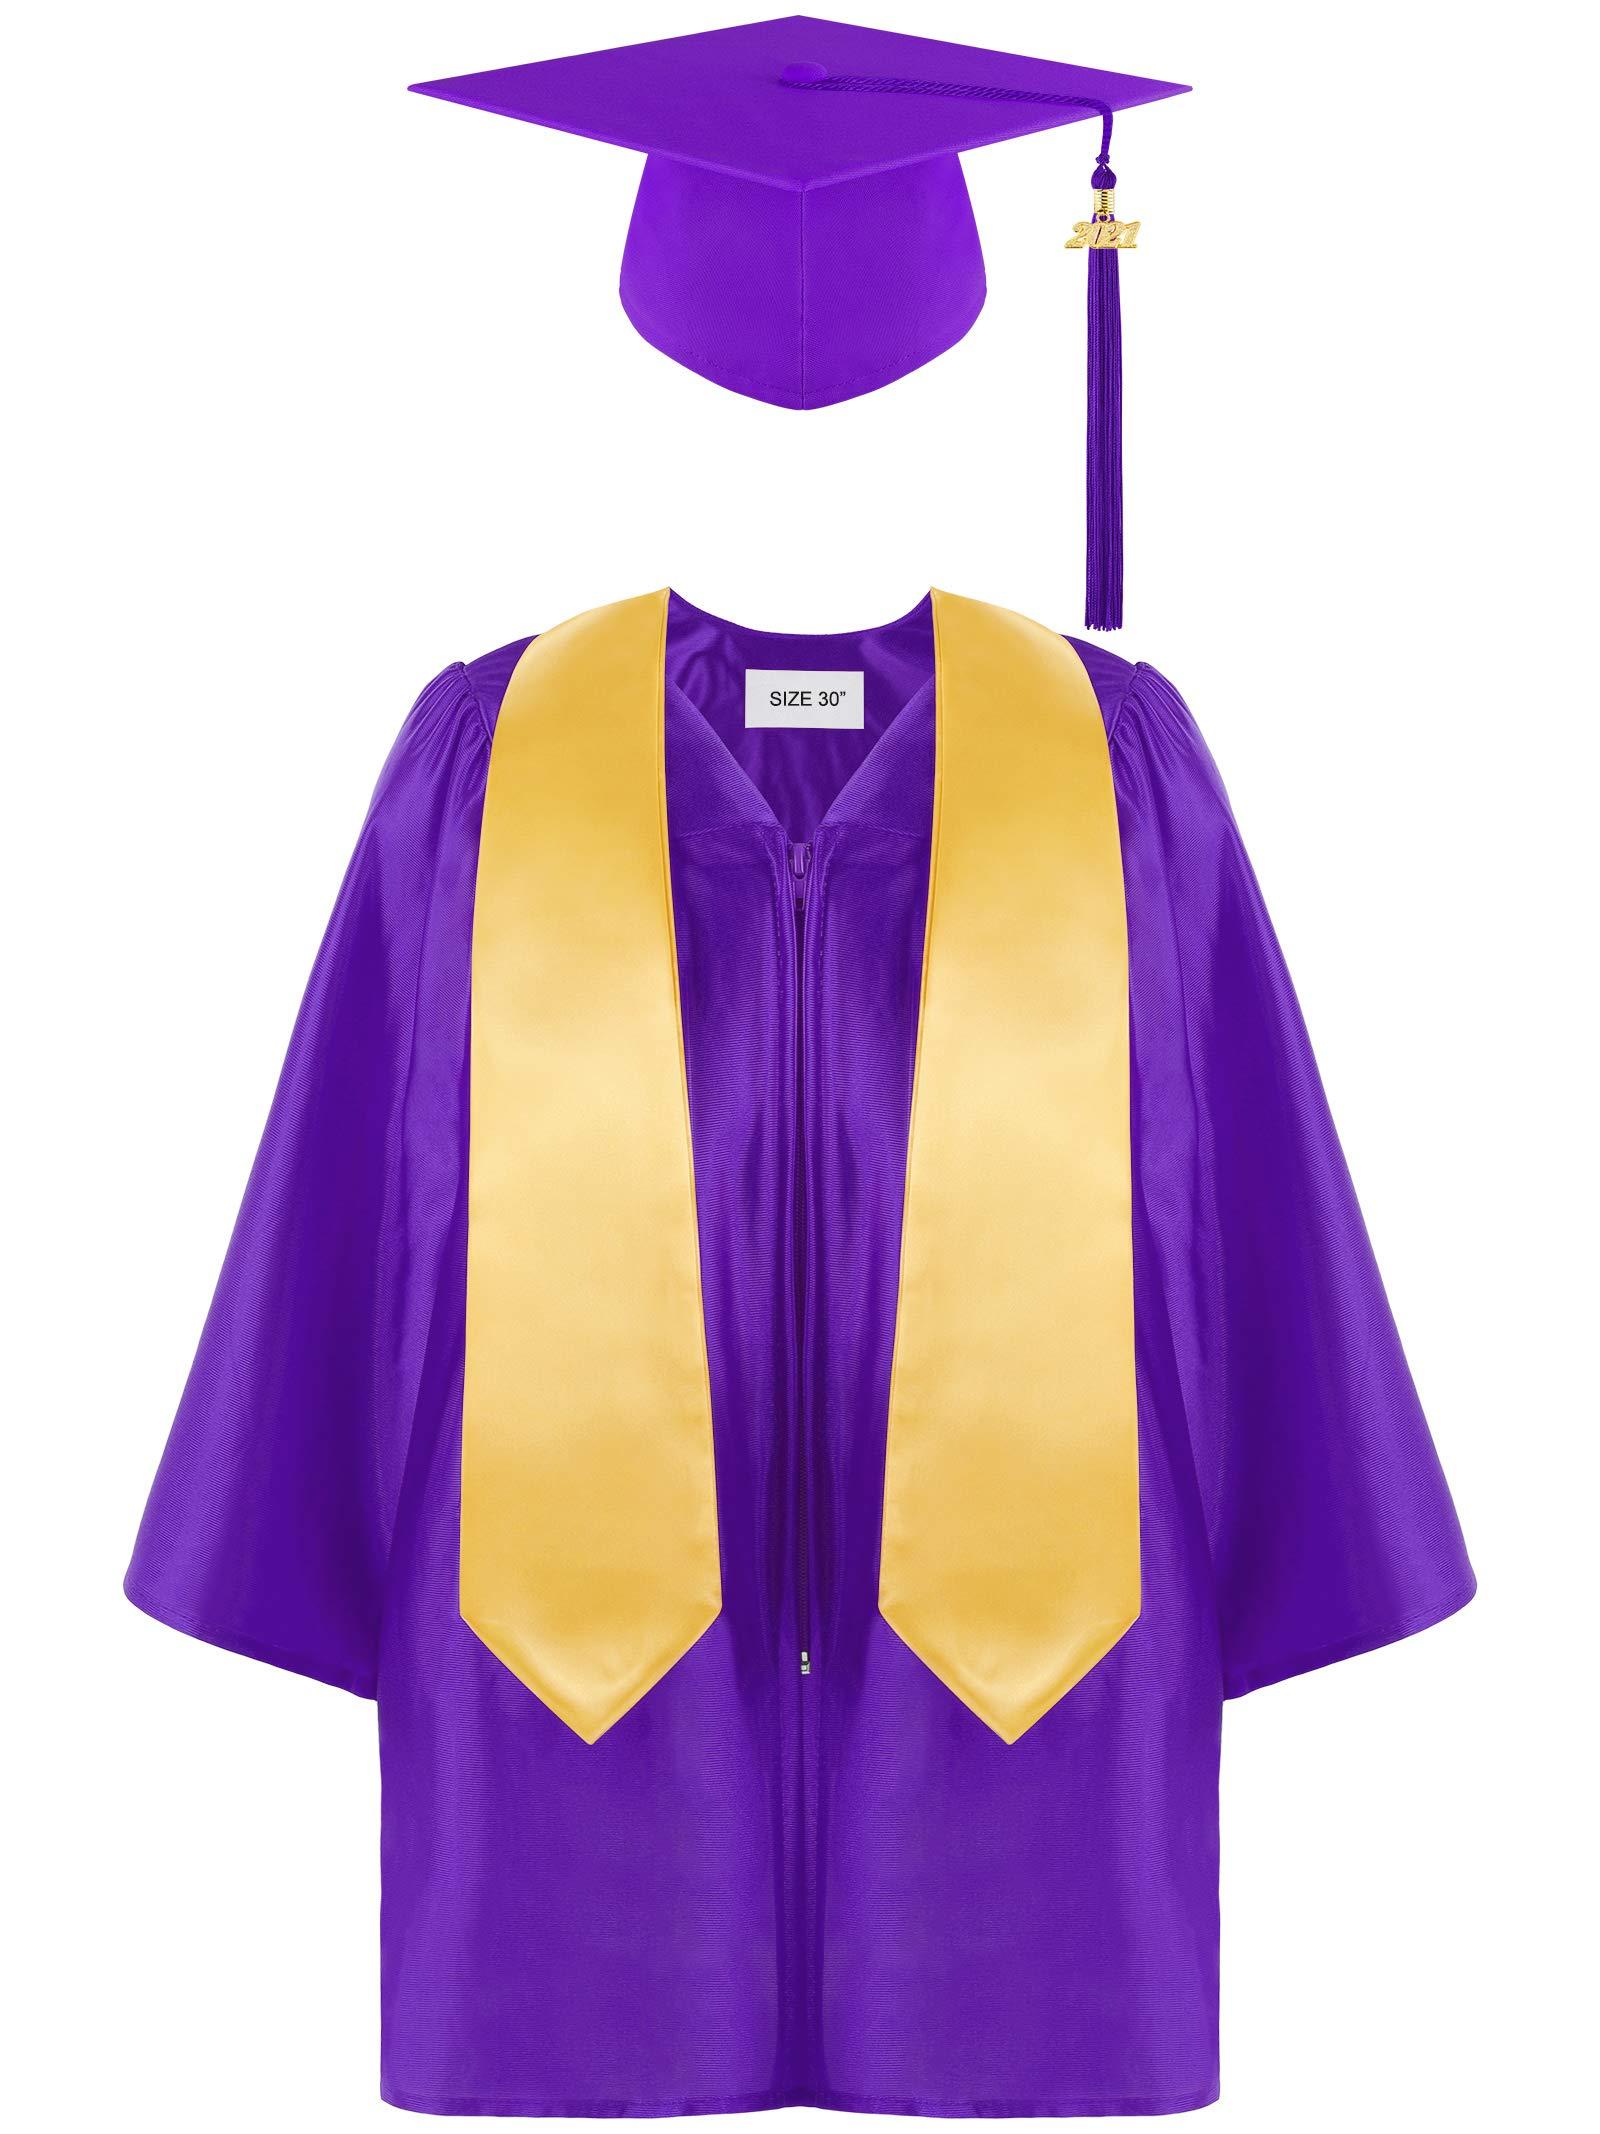 Aneco Preschool Kindergarten Graduation Gown Cap Set with 2021 Tassel and Graduation Sash for Child Size